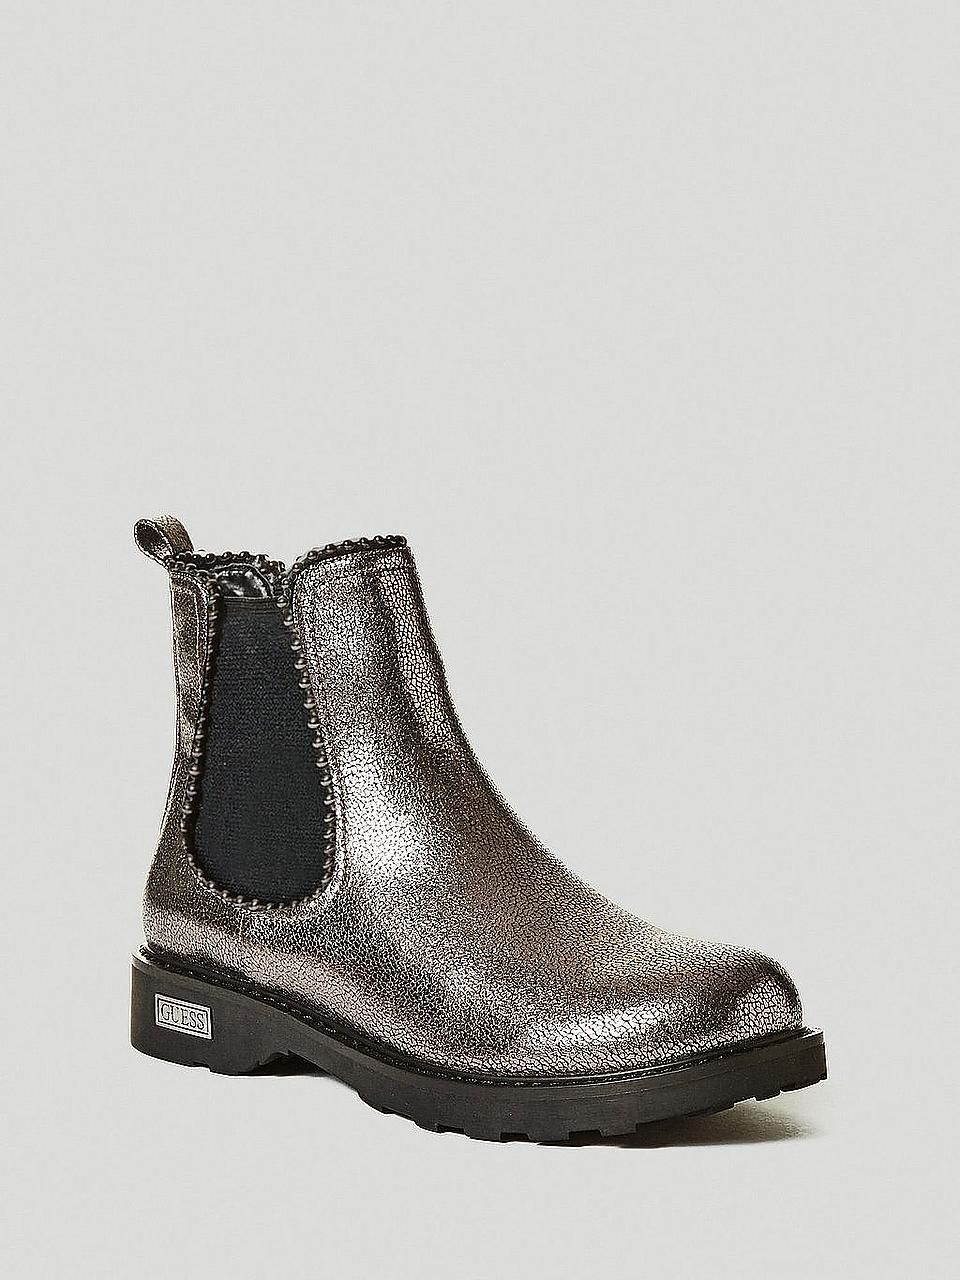 Bike : Schuhe, Turnschuhe, Sandalen, Stiefel, Modekleidung